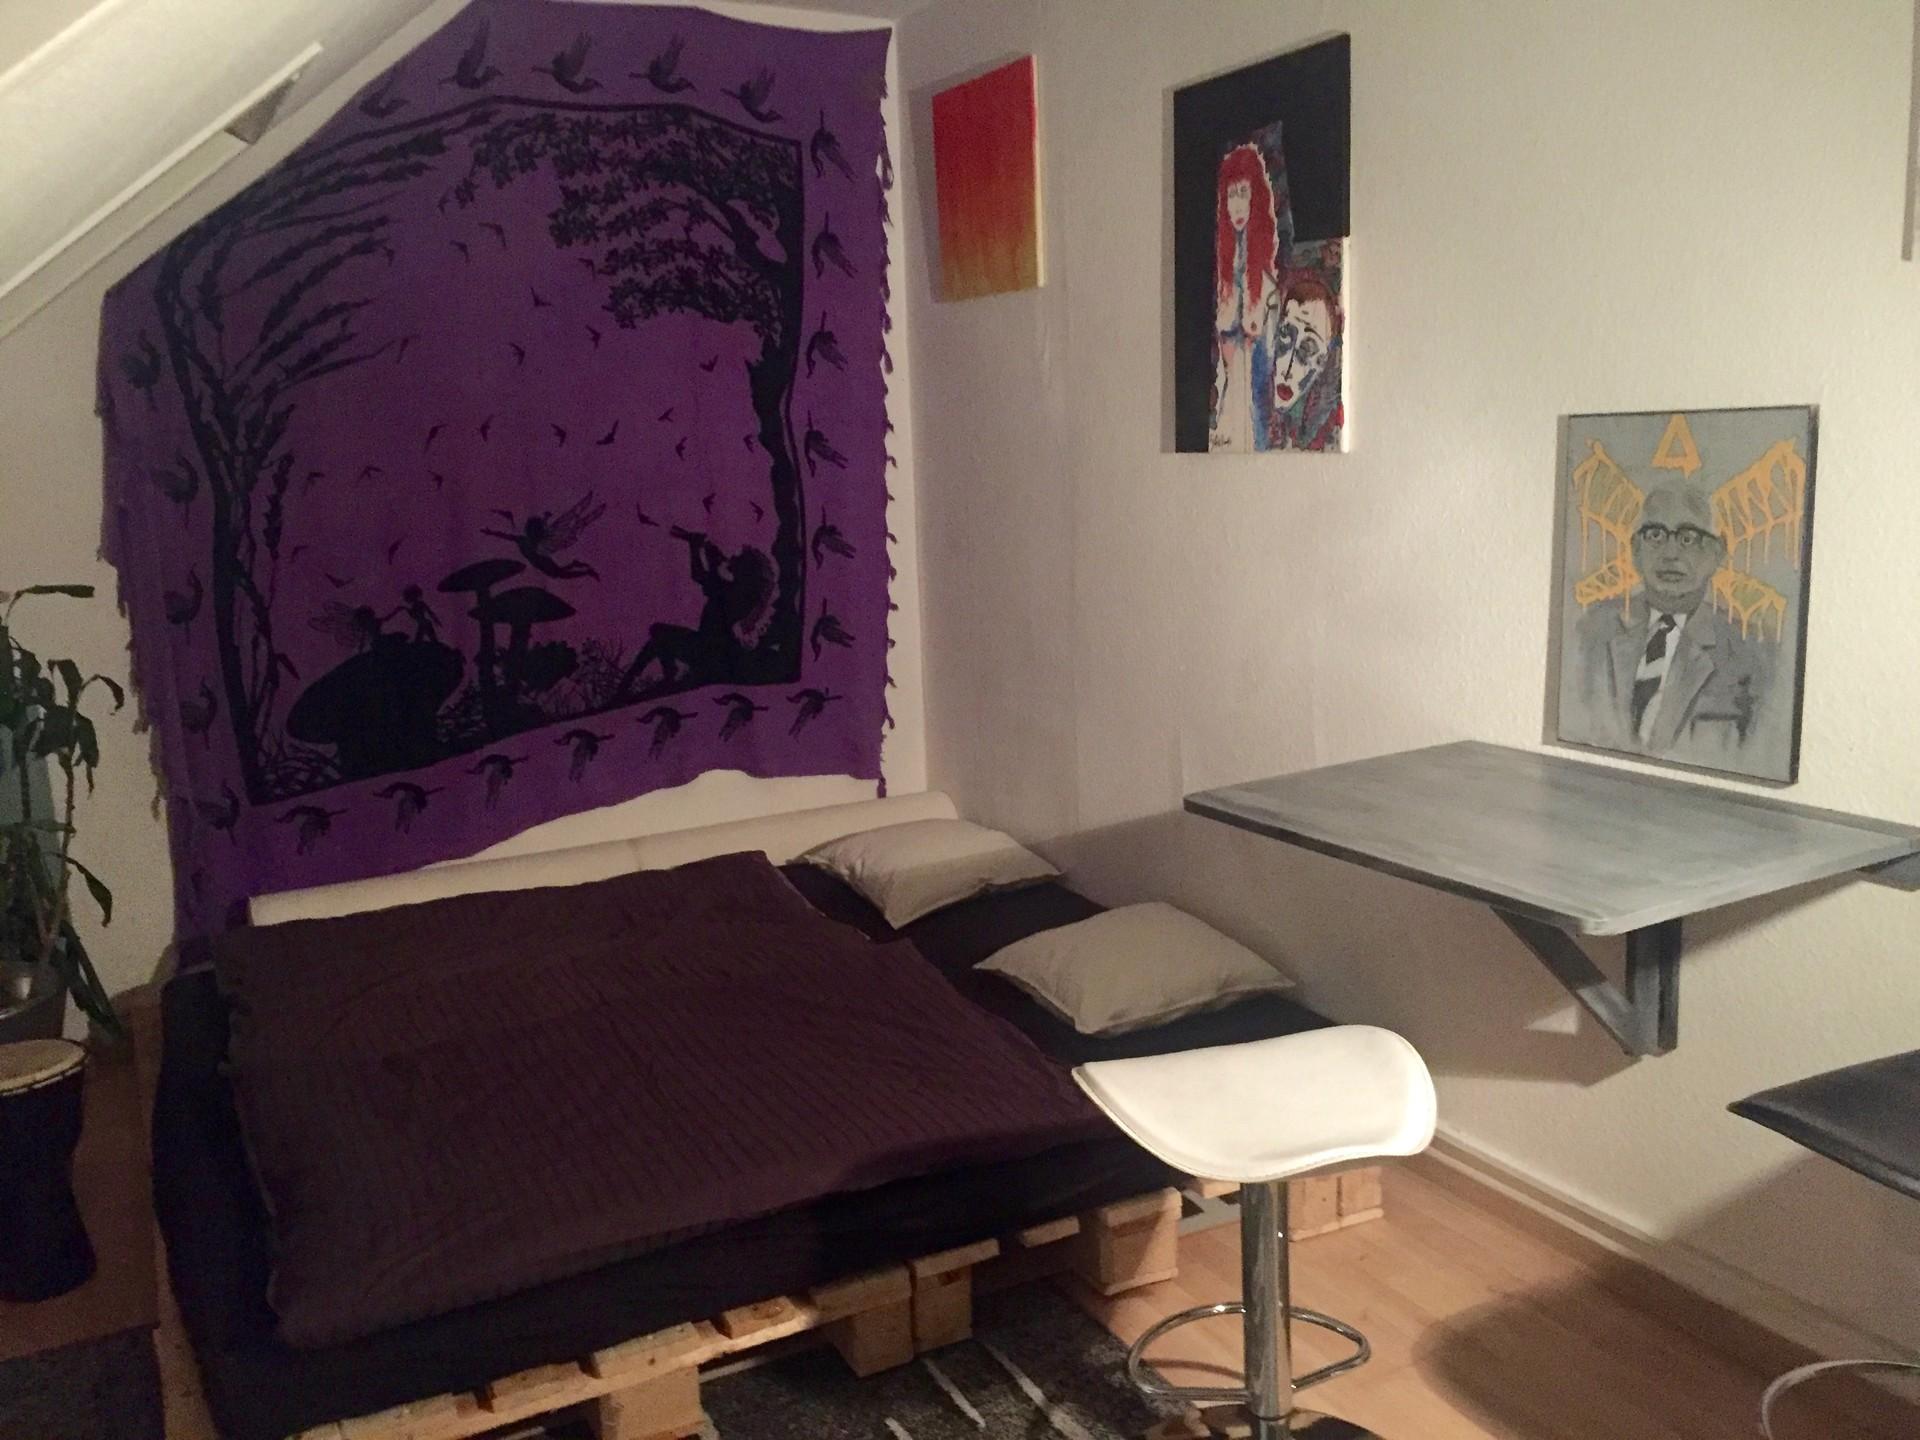 cozy-artsy-studio-heart-frankfurt-1c75e2616de653acc43ed7fc9c58f78b